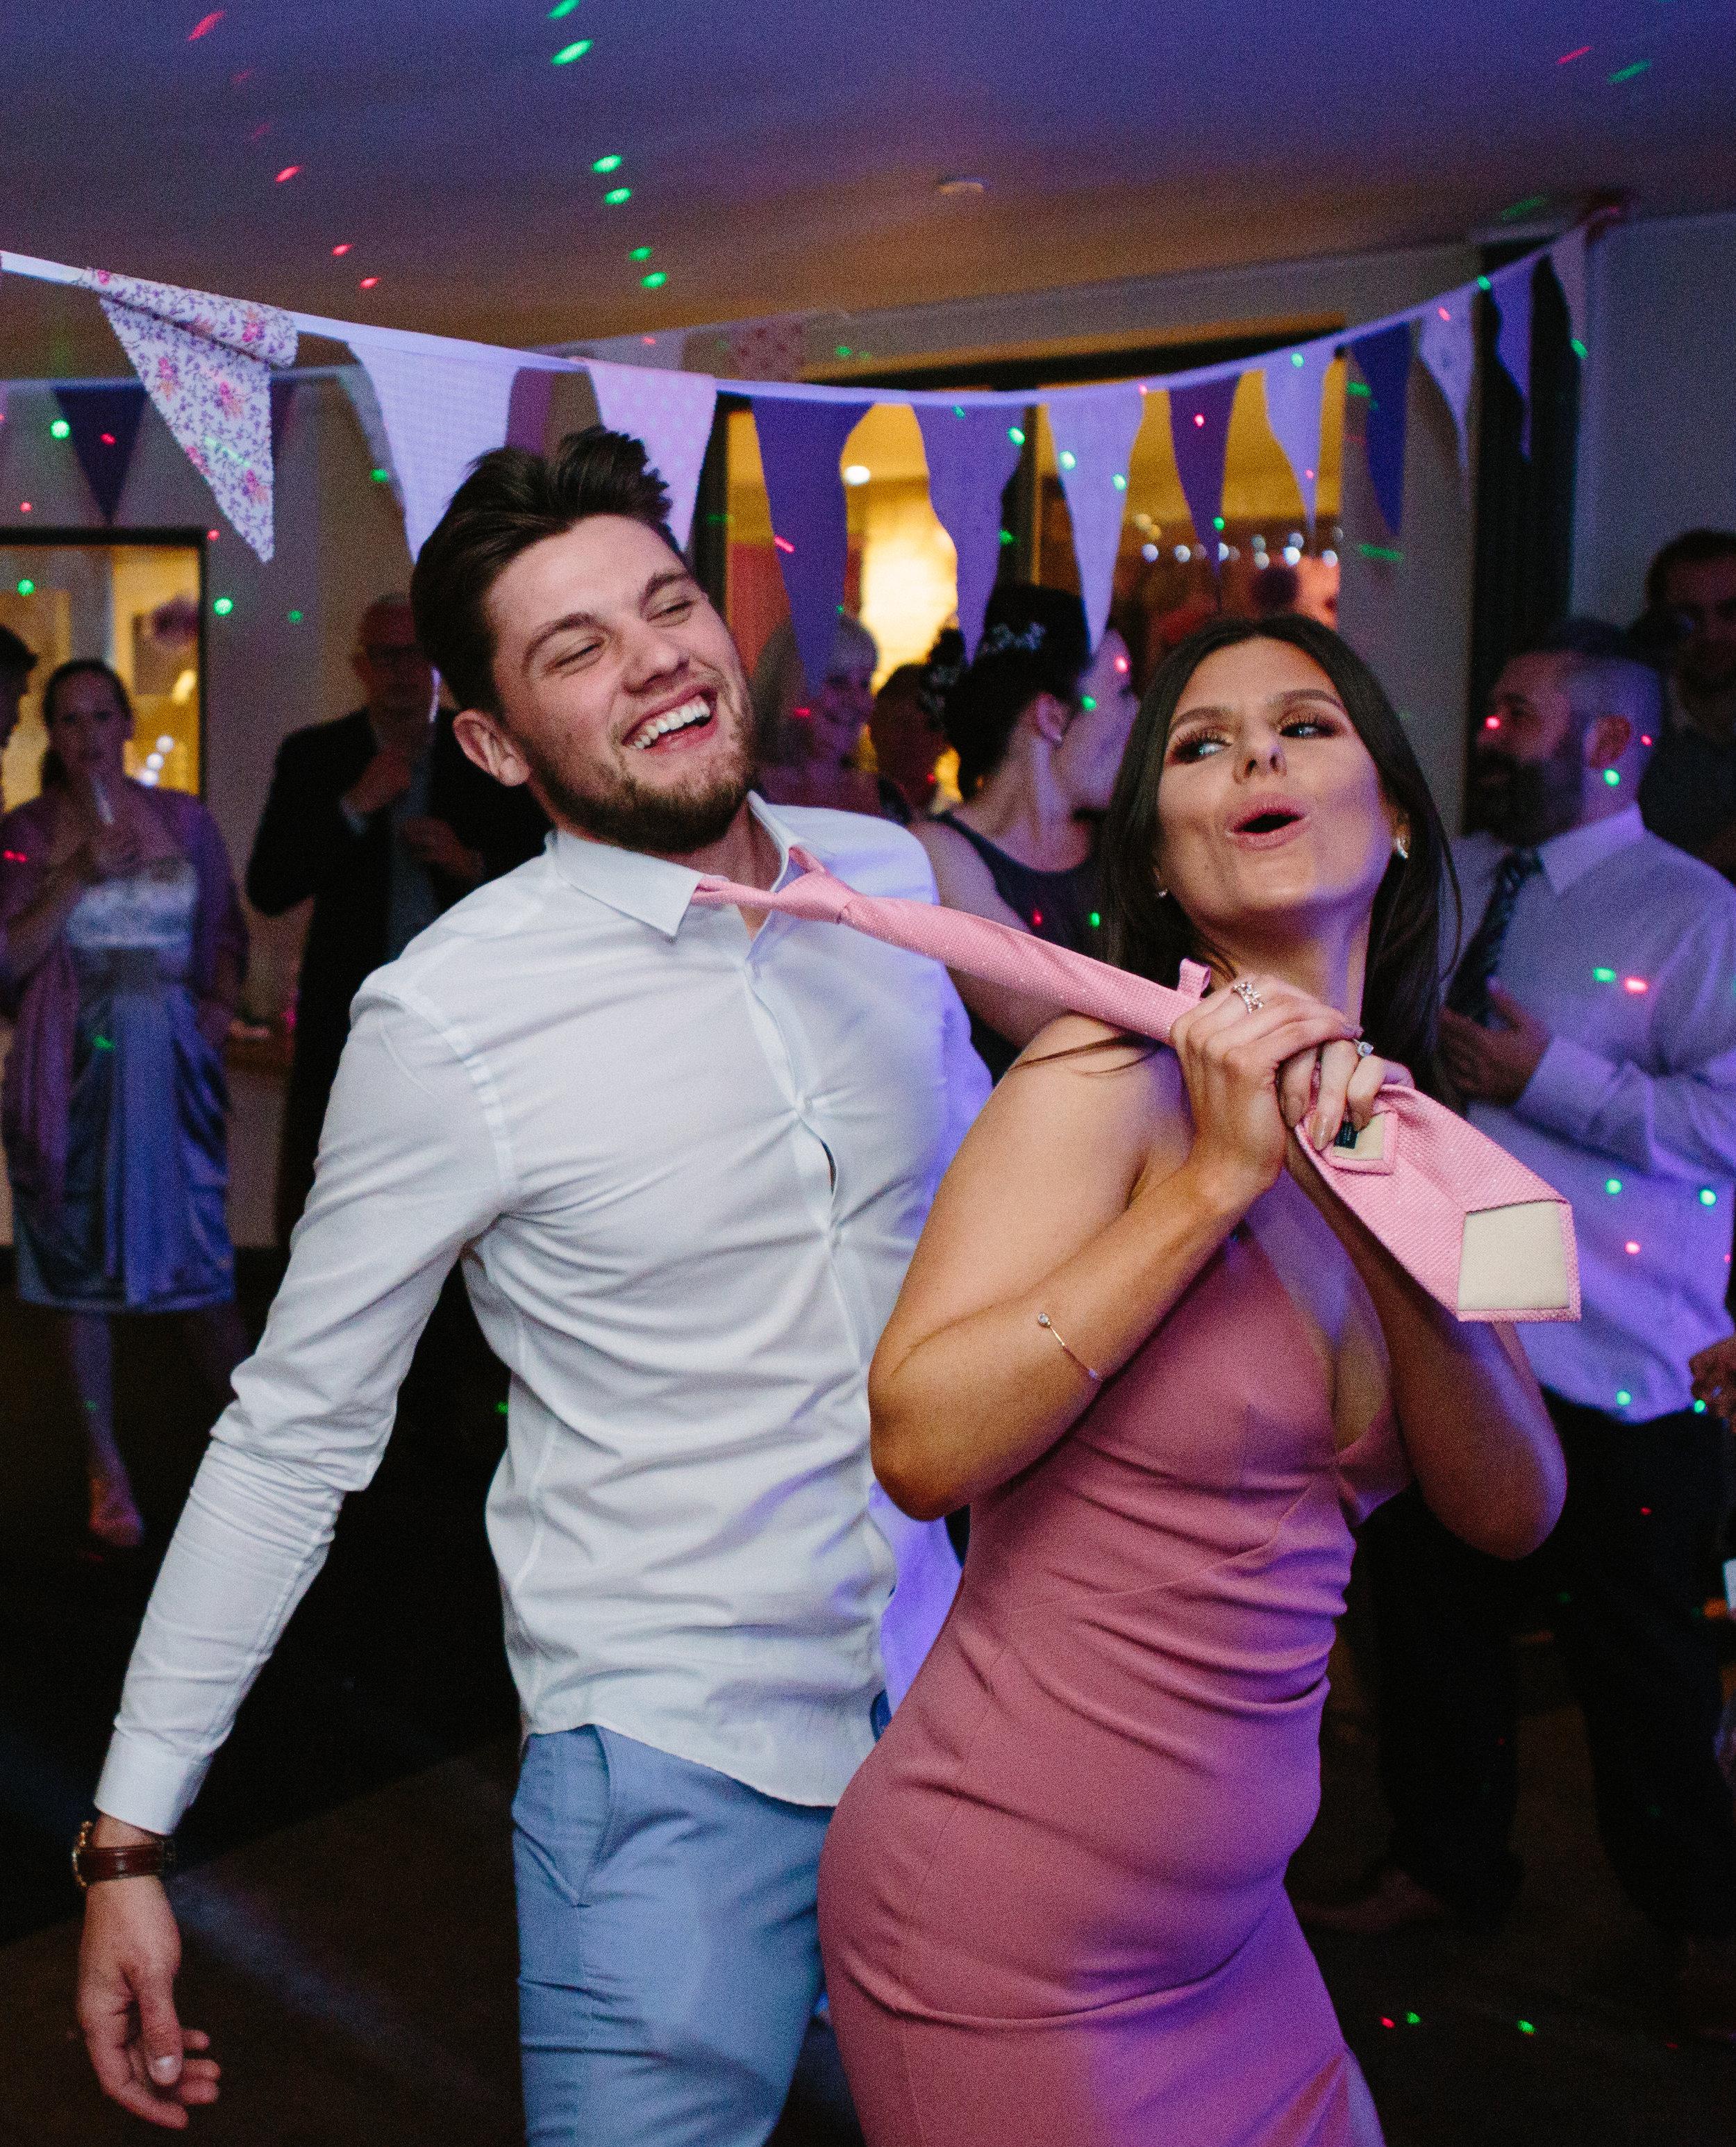 cotswalds-chipping-norton-oxfordshire-london-wedding-photography-dance-53